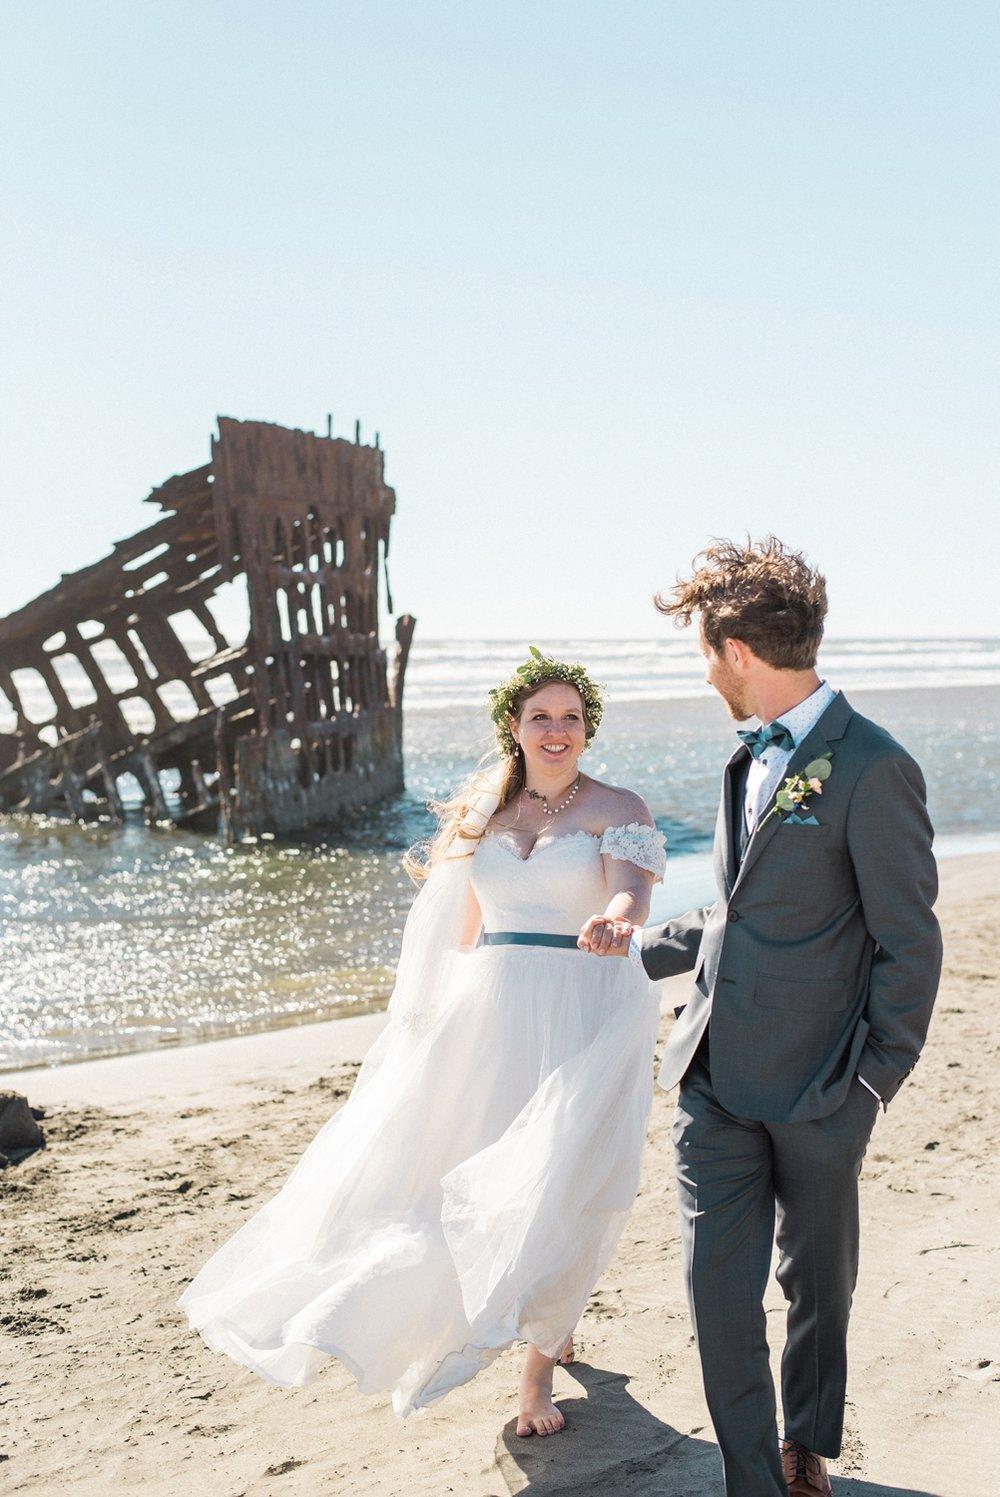 astoria-wedding-fort-stevens-oregon-kc-shelley-marie-photo-0938_cr.jpg